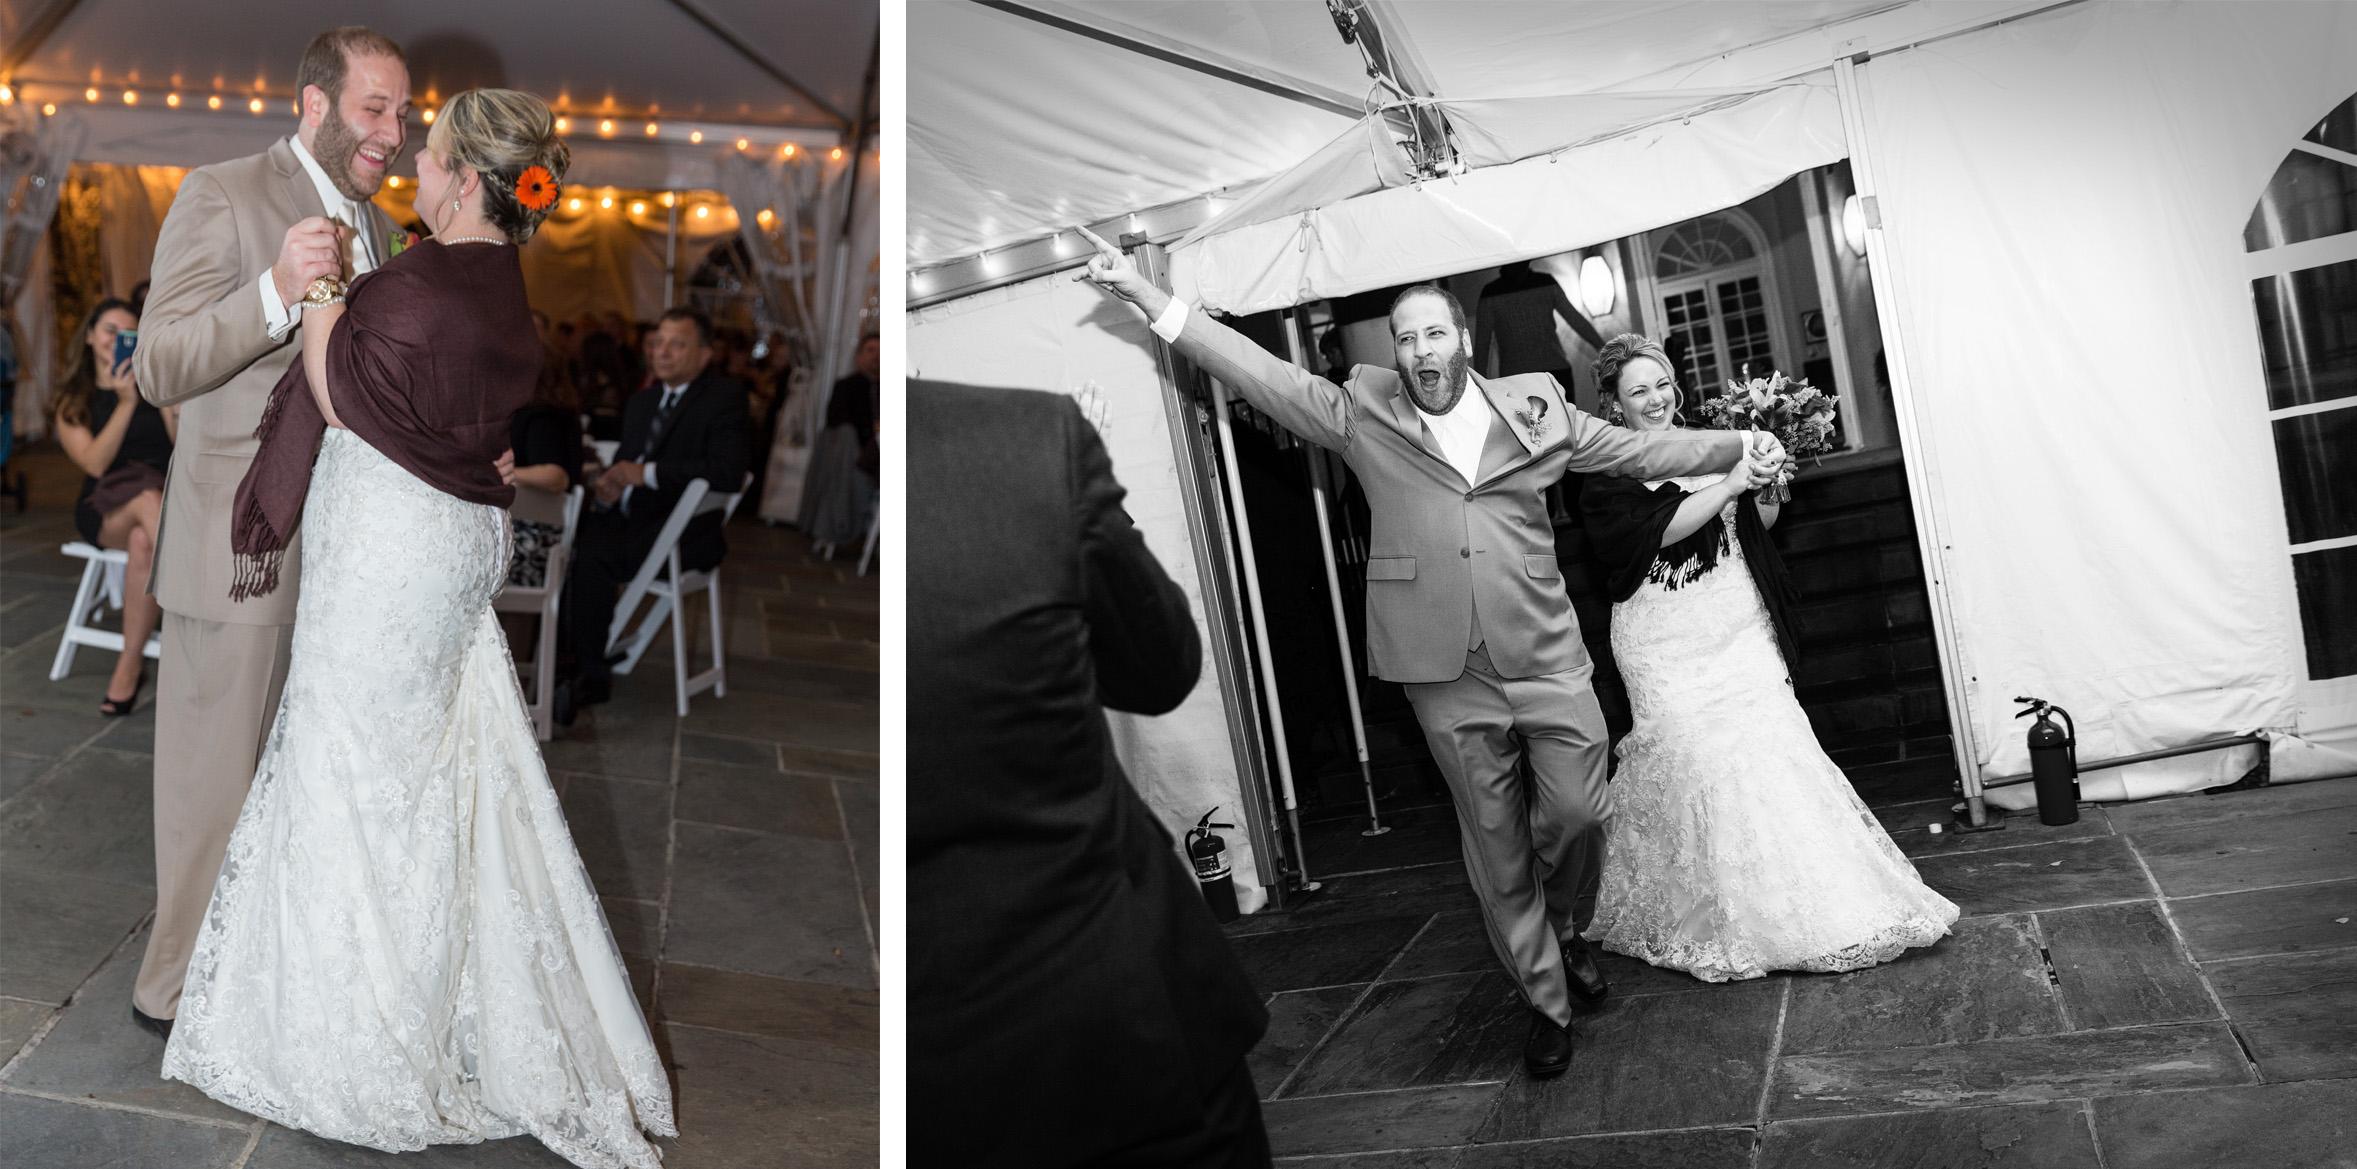 21-first-dance-mr-mrs.jpg